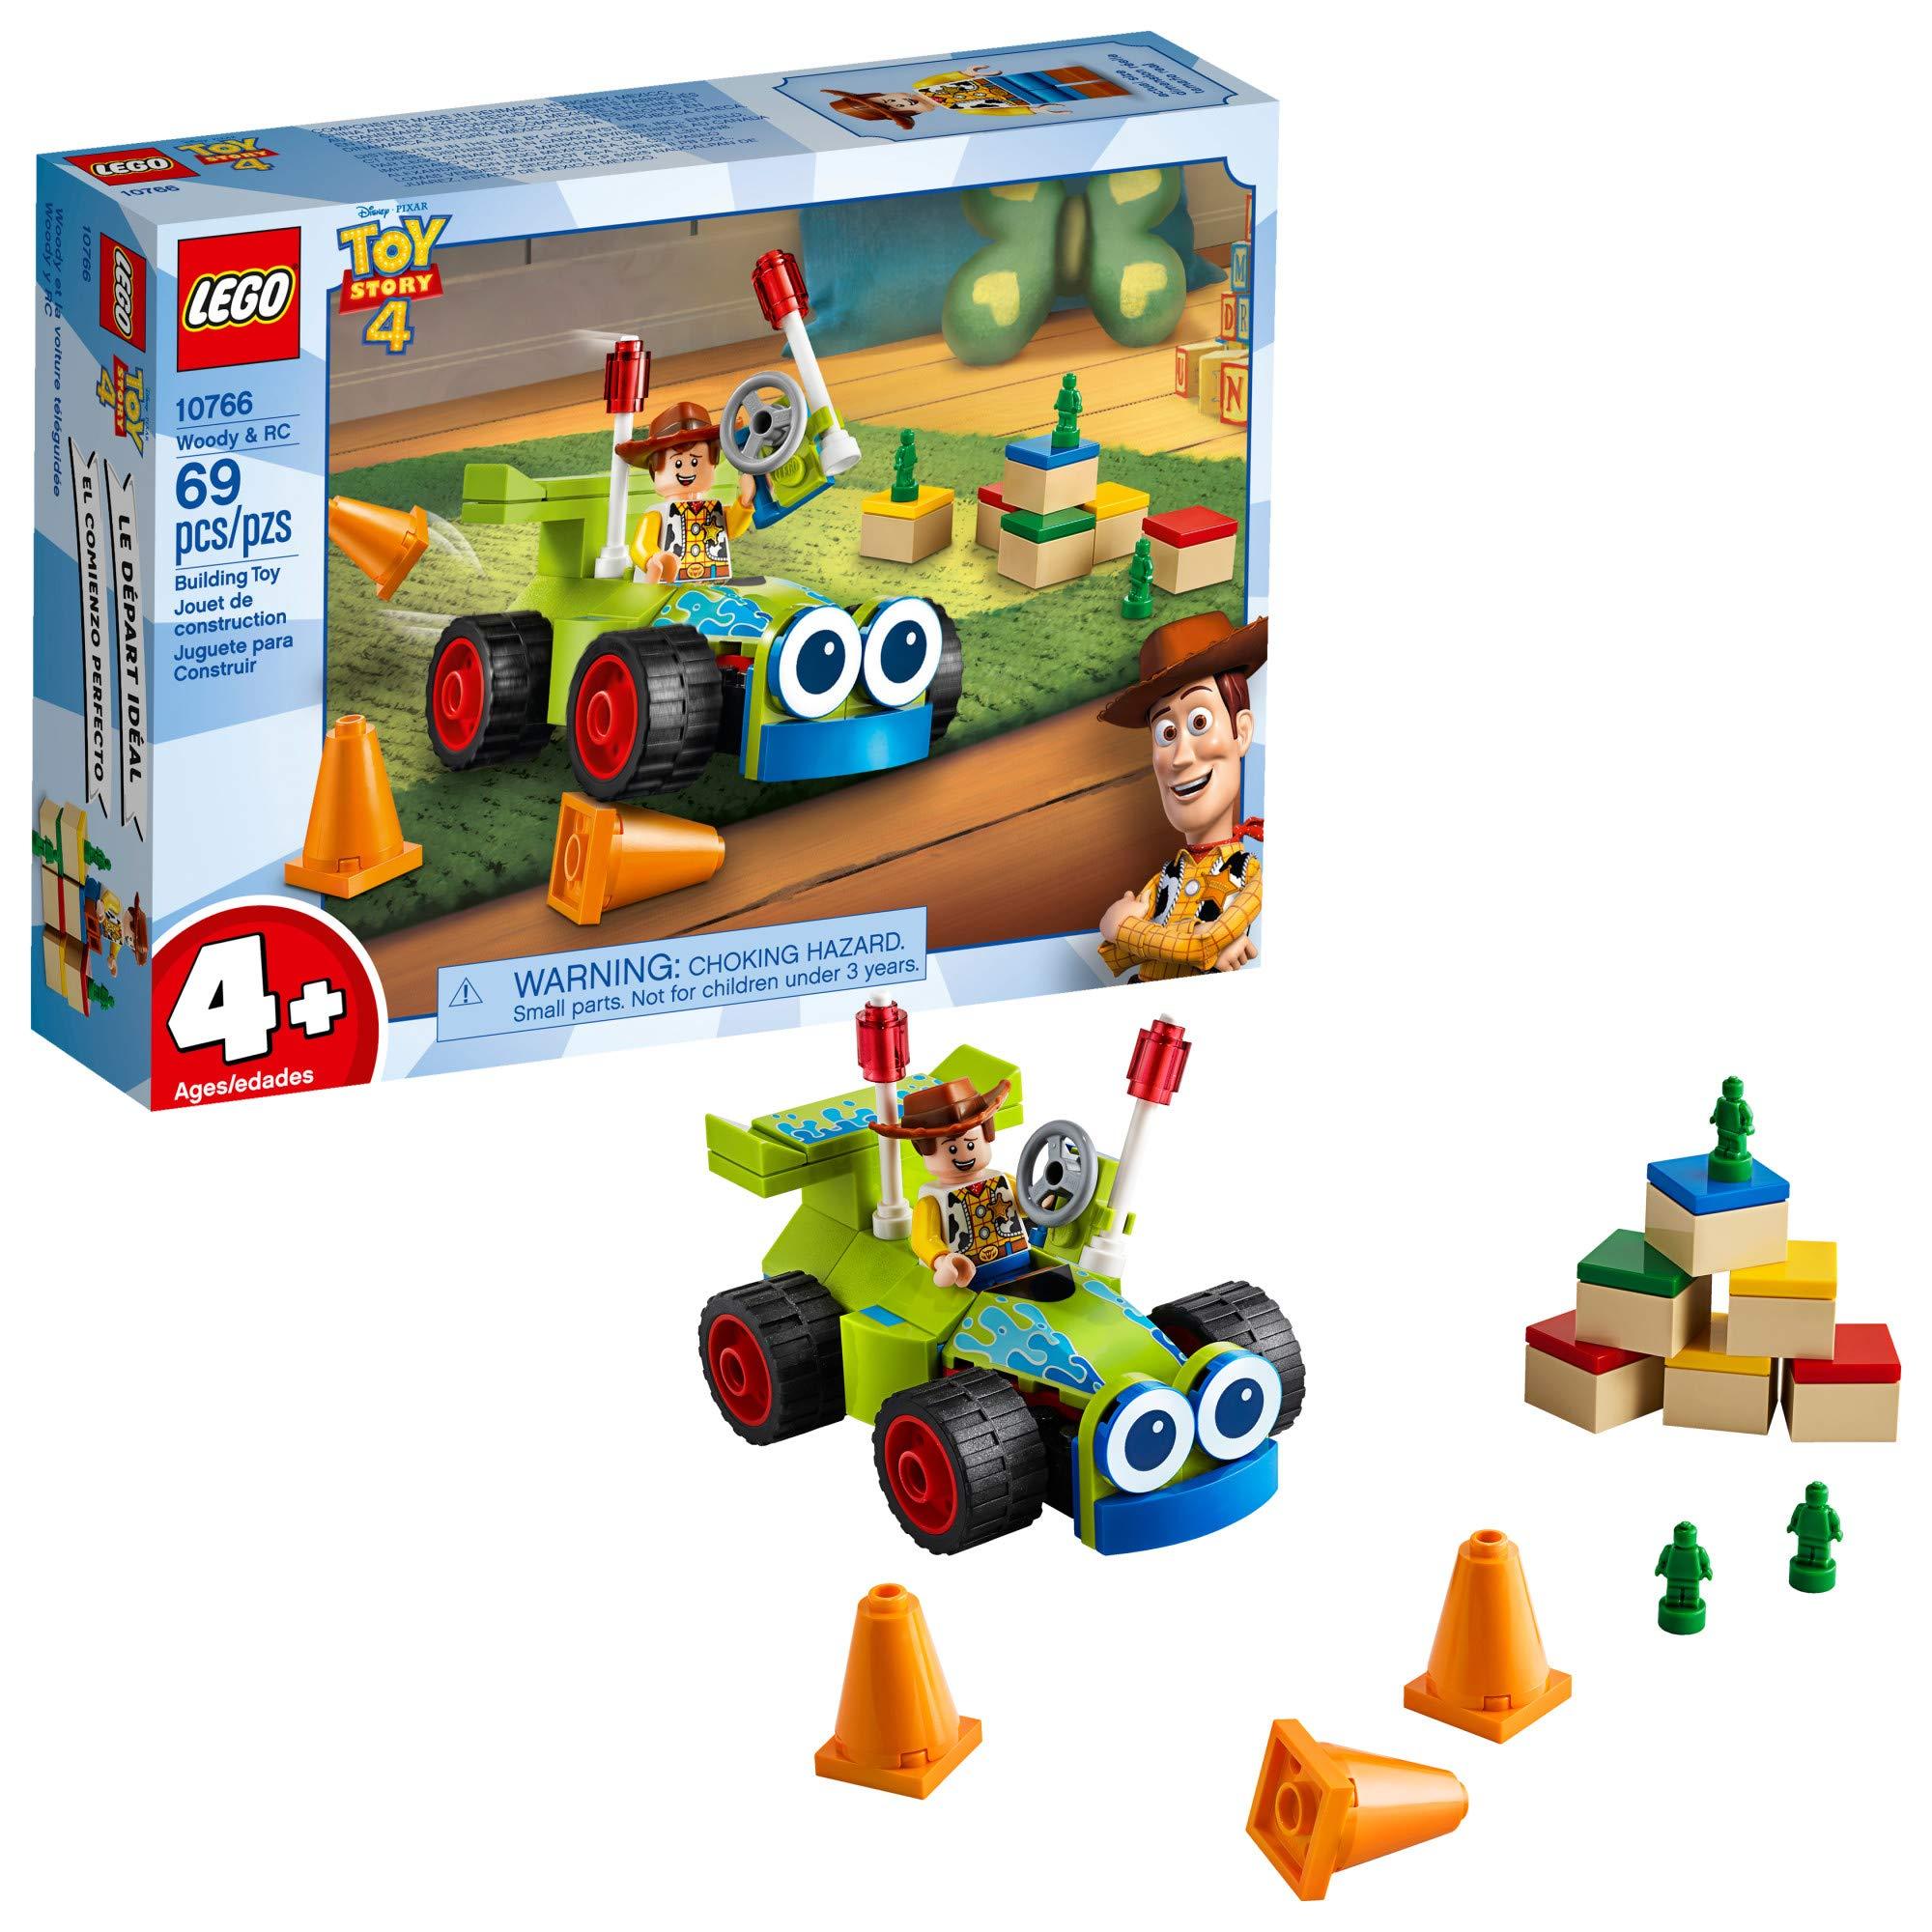 ویکالا · خرید  اصل اورجینال · خرید از آمازون · LEGO   Disney Pixar's Toy Story 4 Woody & RC 10766 Building Kit, New 2019 (69 Piece) wekala · ویکالا